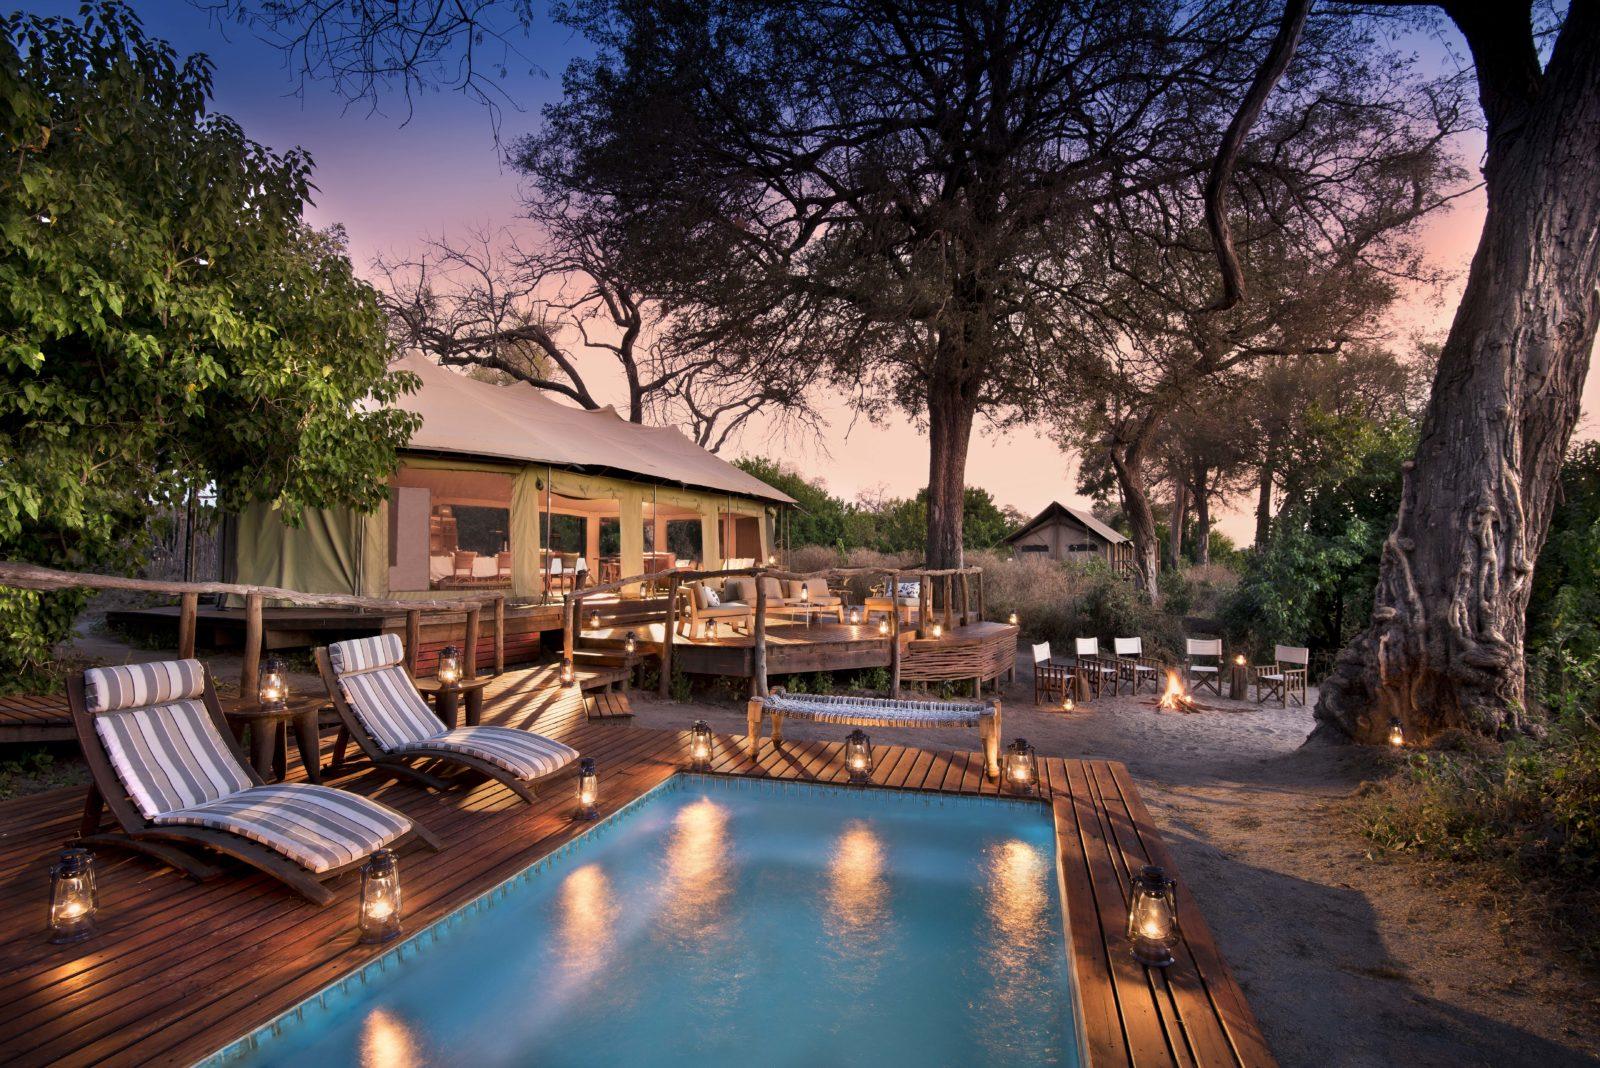 Evening view of Linyanti Ebony Camp swimming pool